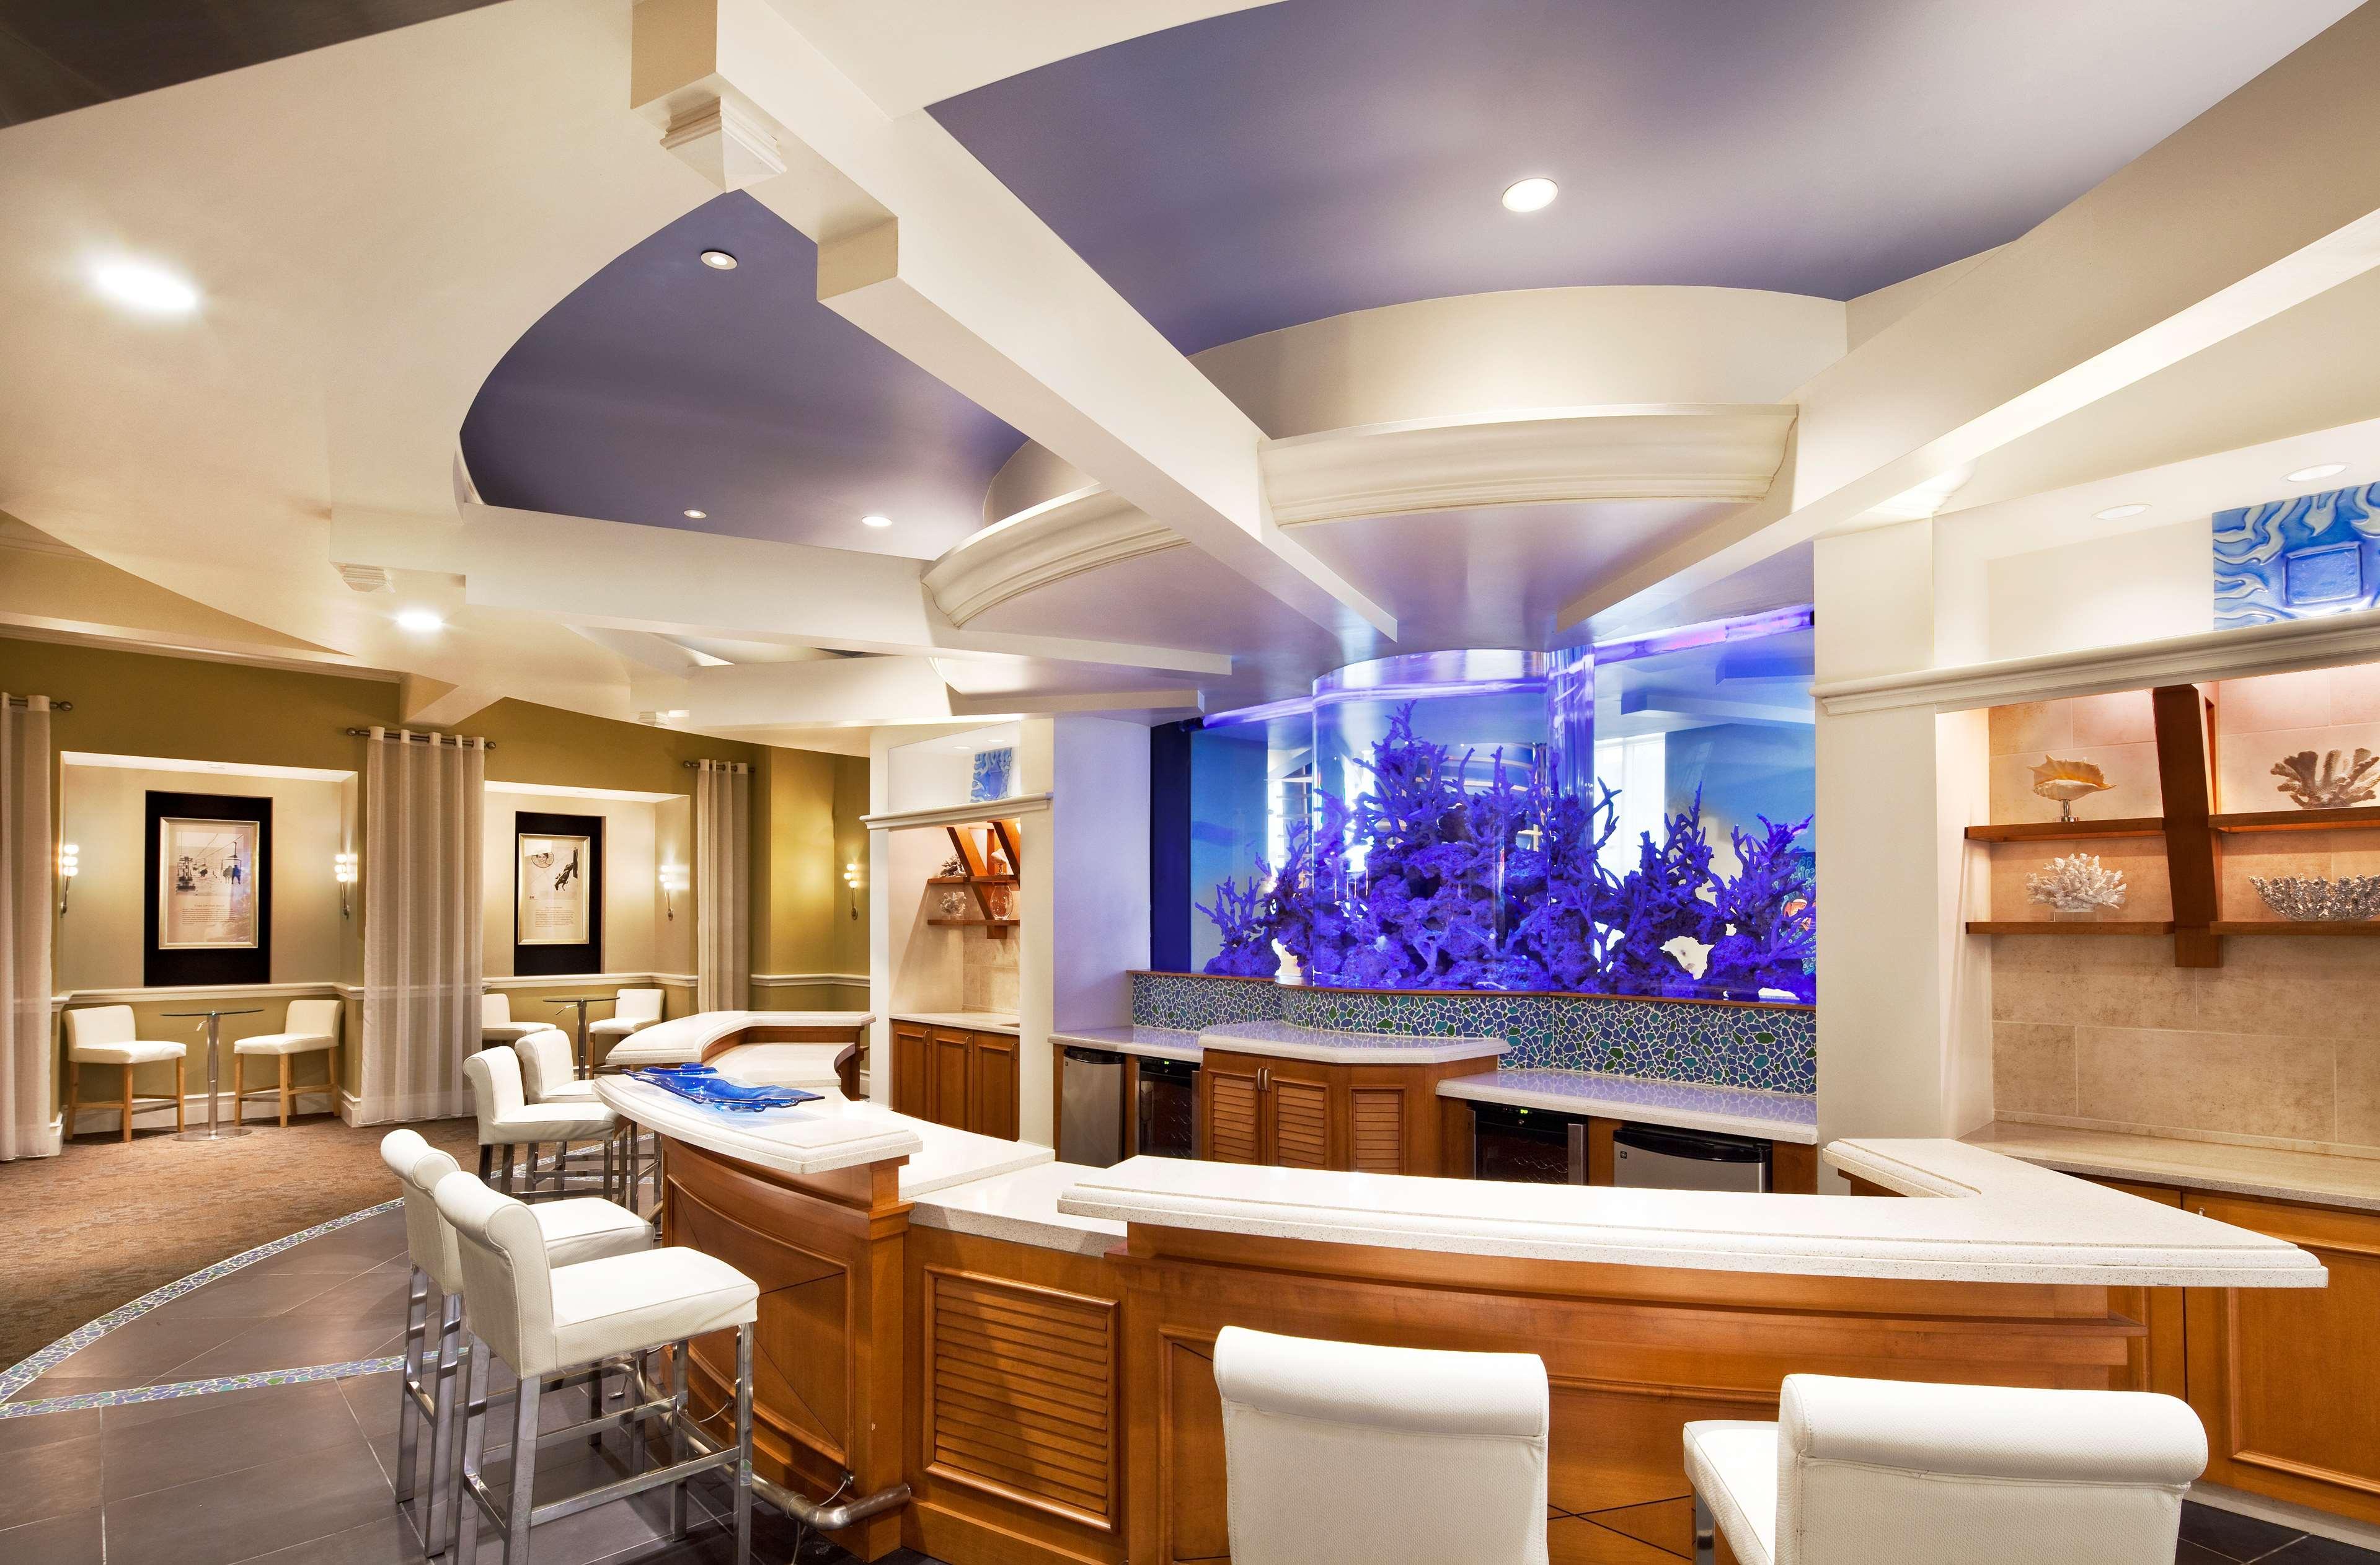 Sheraton Atlantic City Convention Center Hotel image 14